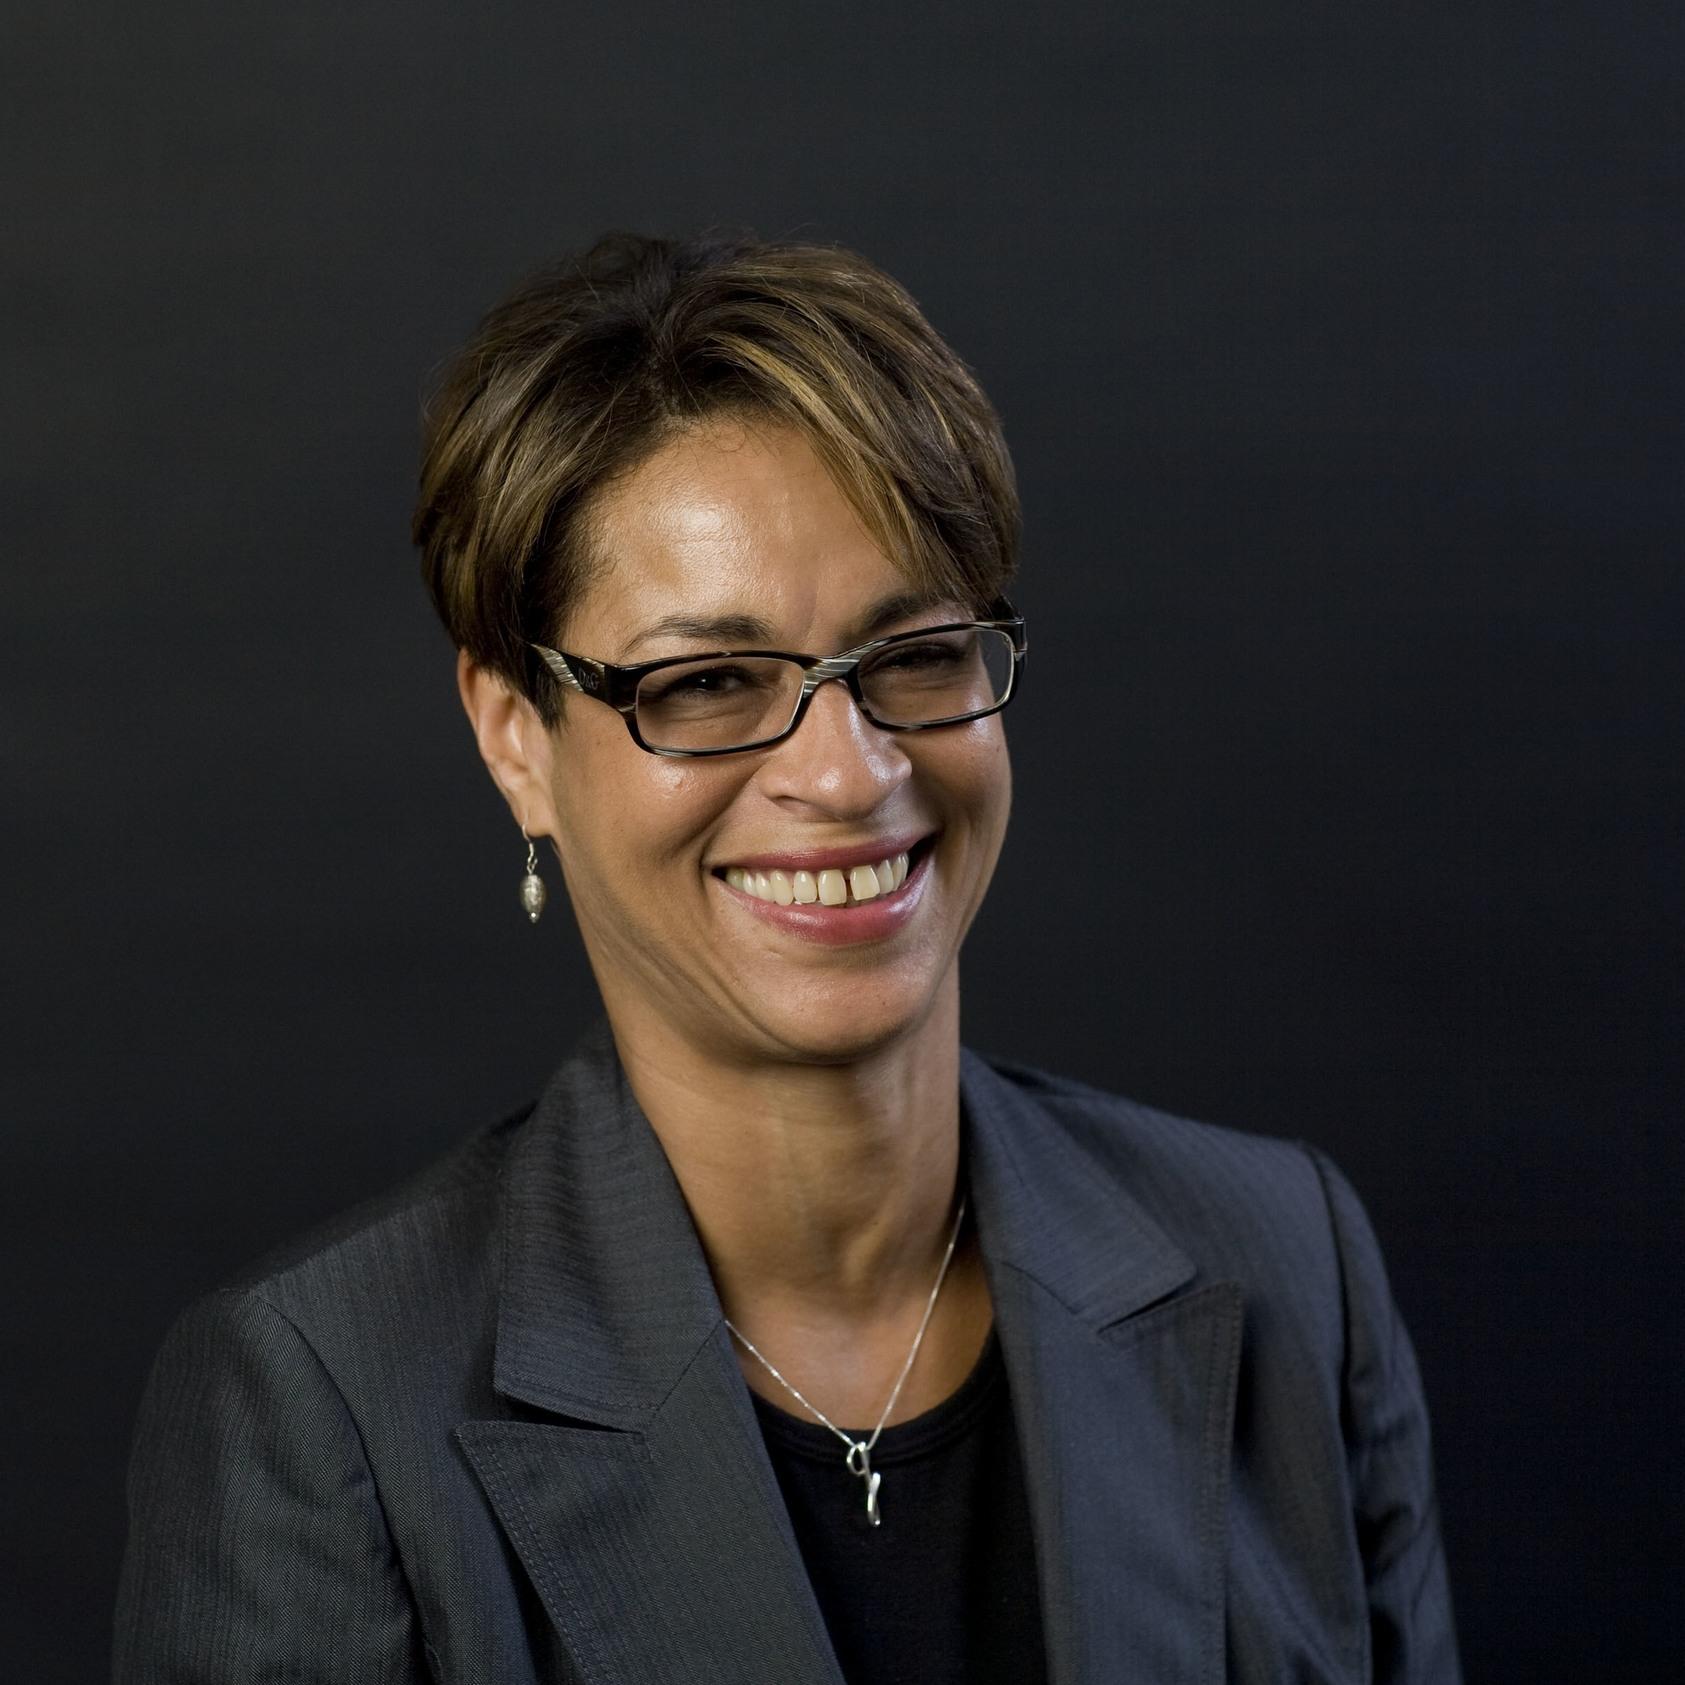 Gabrielle Bullock, FAIA, NOMA, IIDA, LEED AP